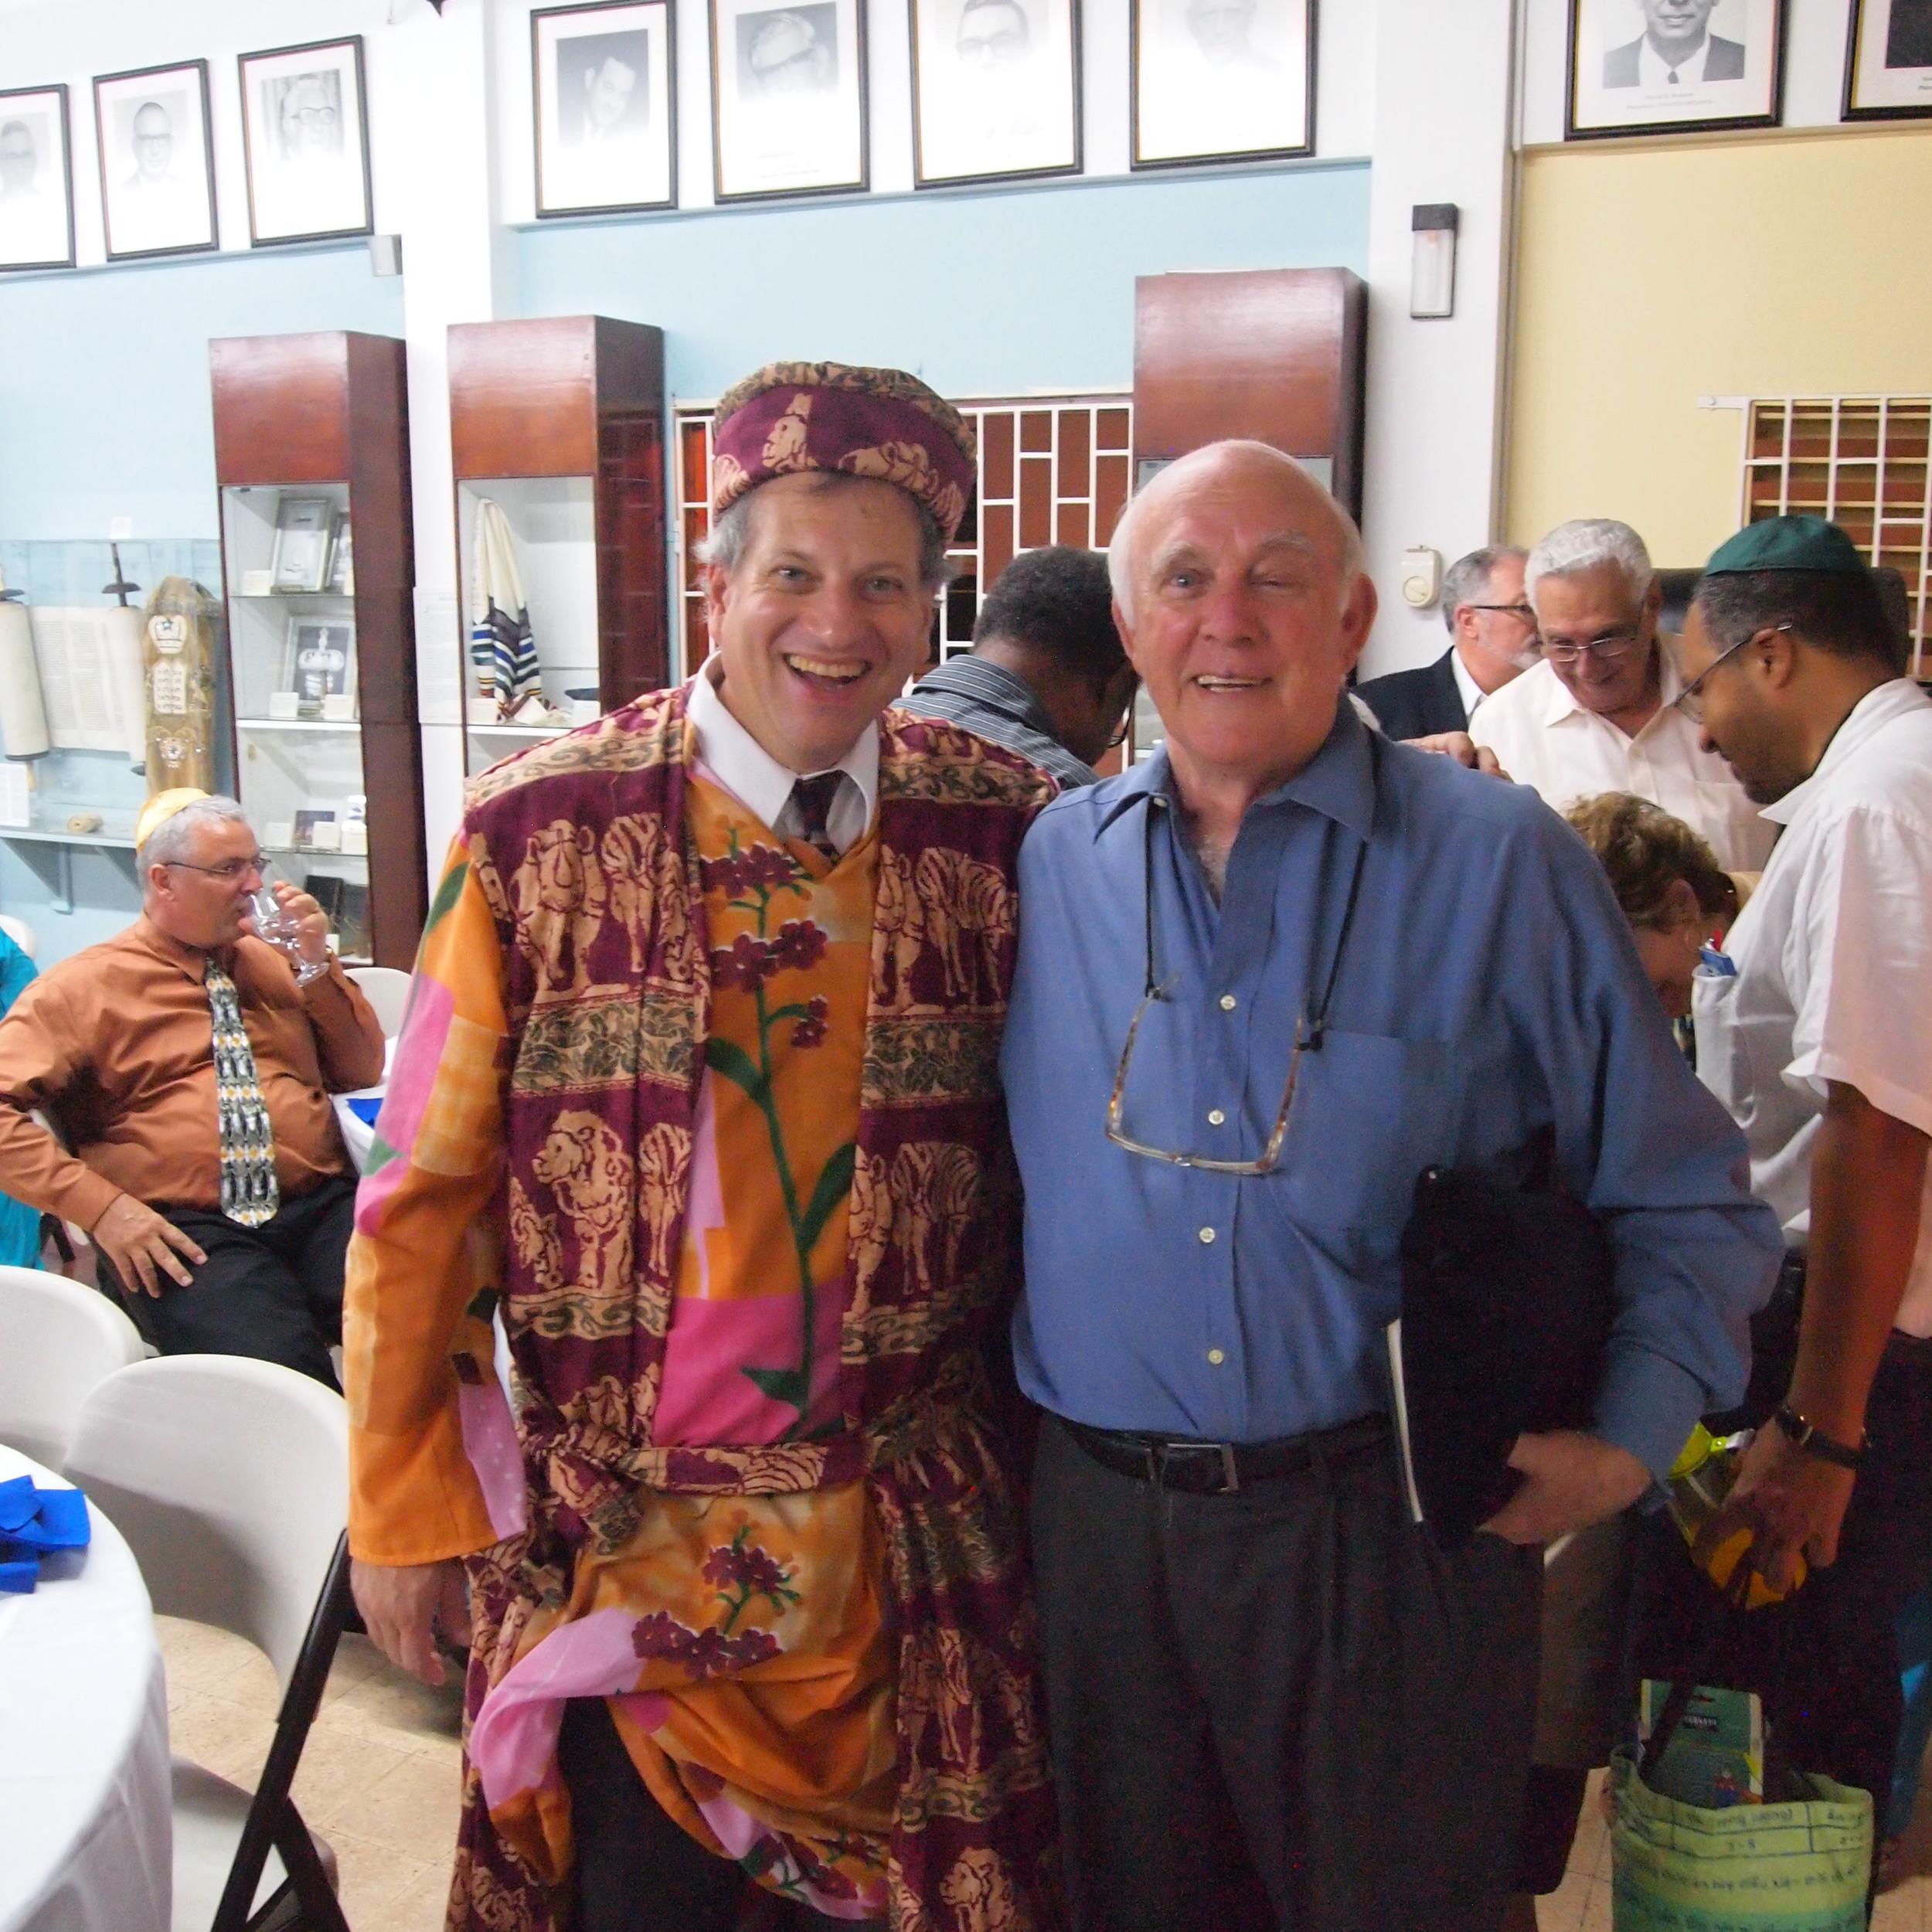 Click photo to download. Caption: Rabbi Dana Evans Kaplan (left, dressed as Elijah) with Jewish community historian Ainsley Henriques on Passover in Kingston, Jamaica. Credit: Courtesy Rabbi Dana Evans Kaplan.